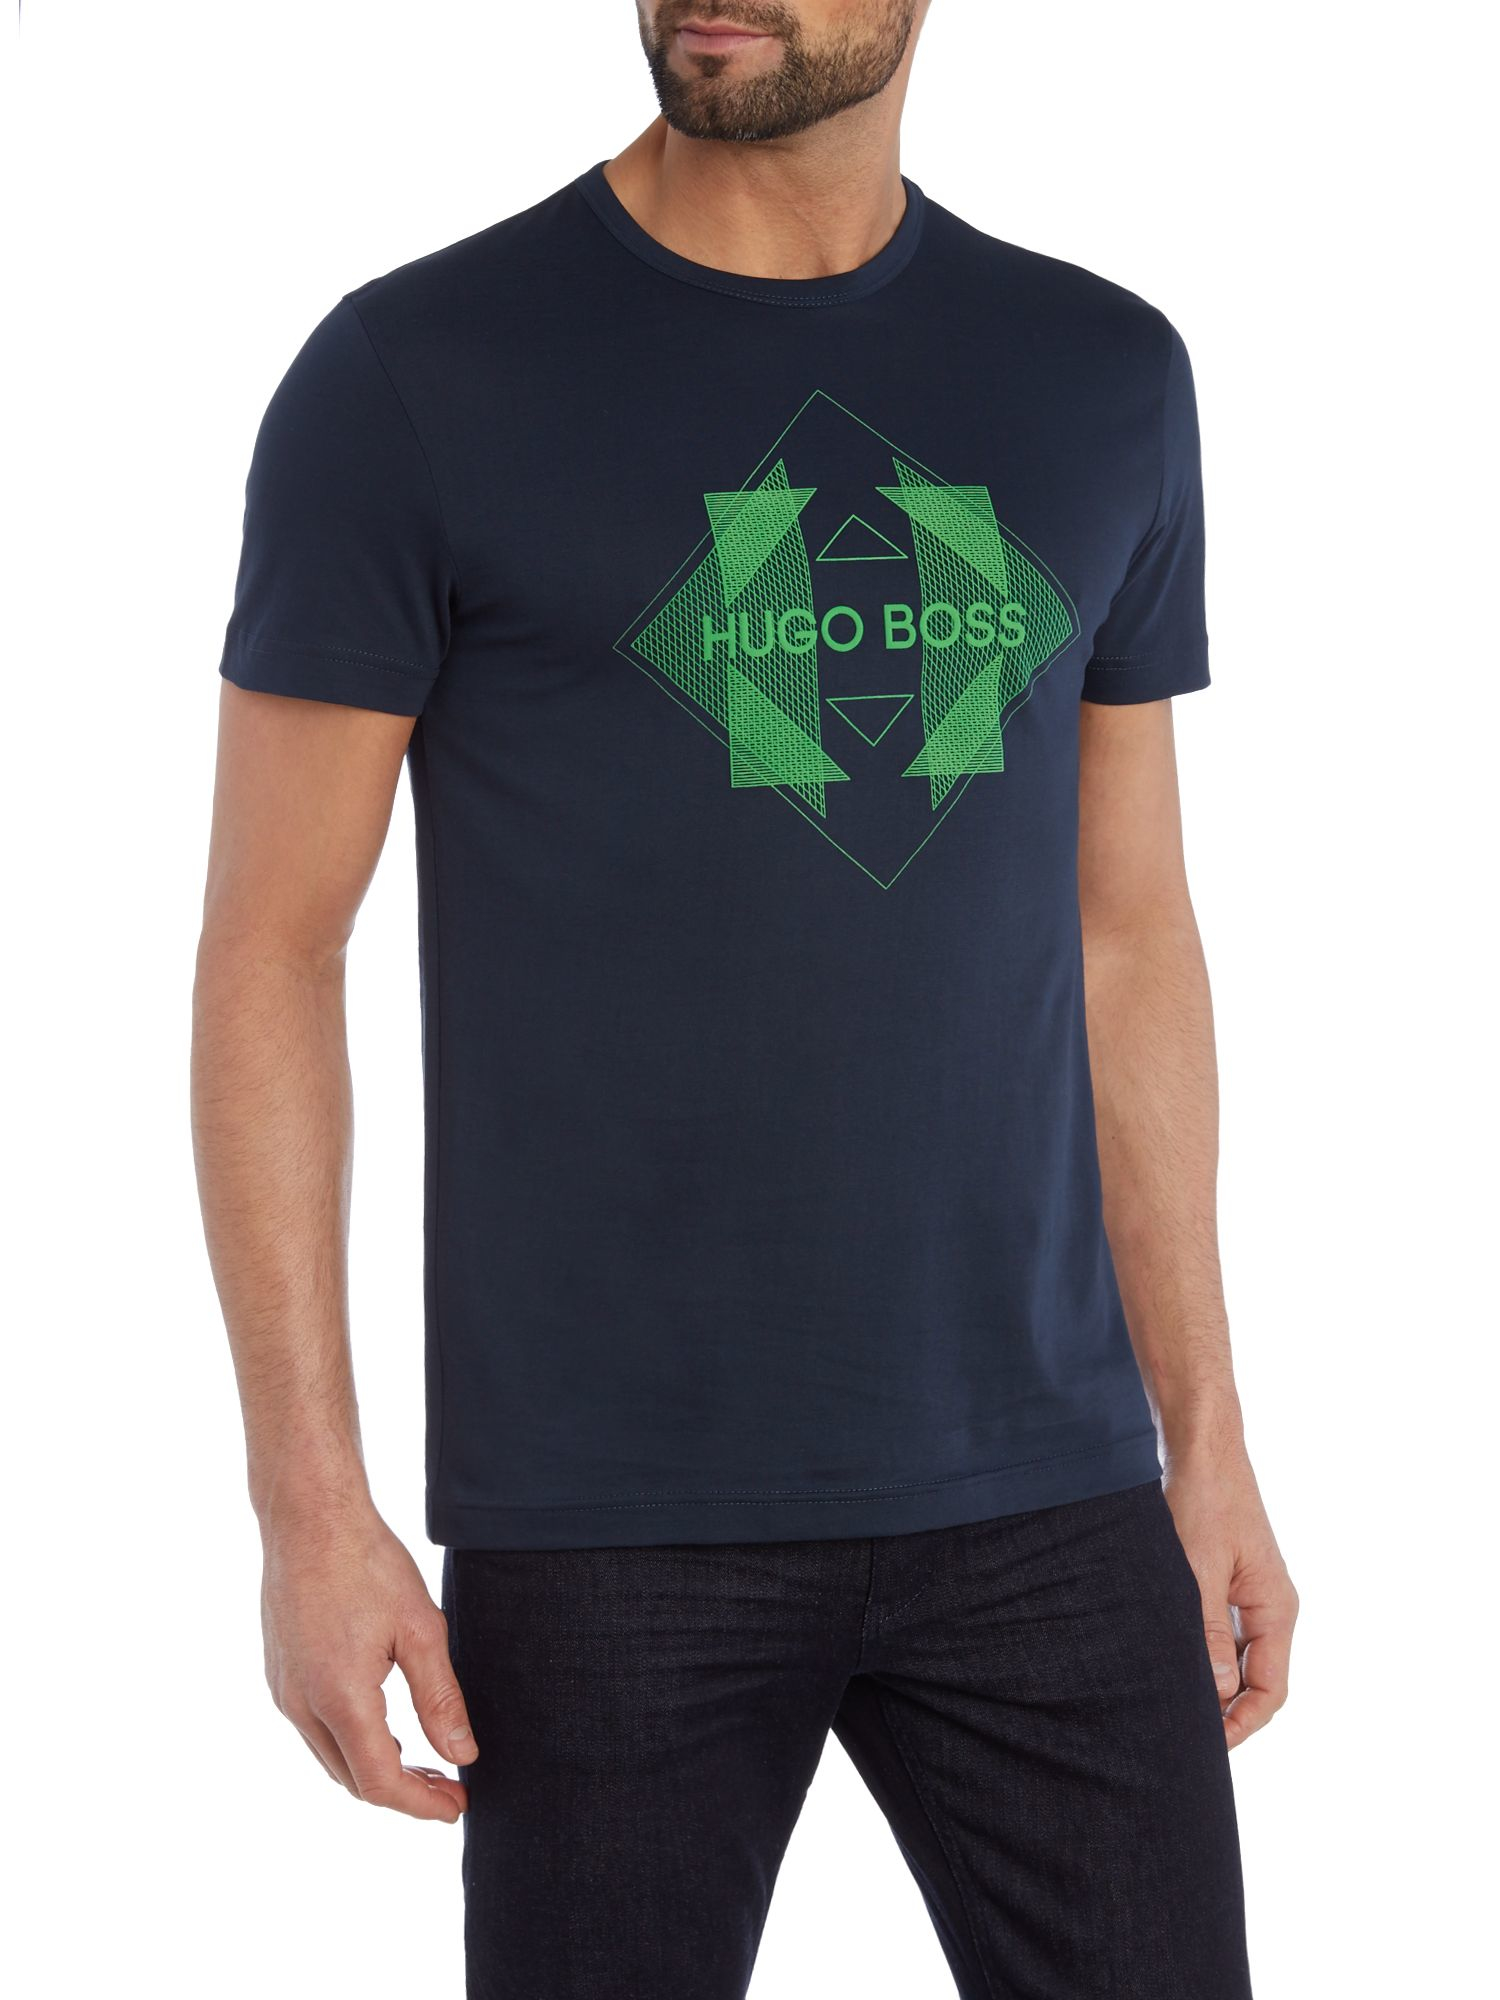 Boss tee 2 regular fit diamond logo printed t shirt in for Logo printed t shirts